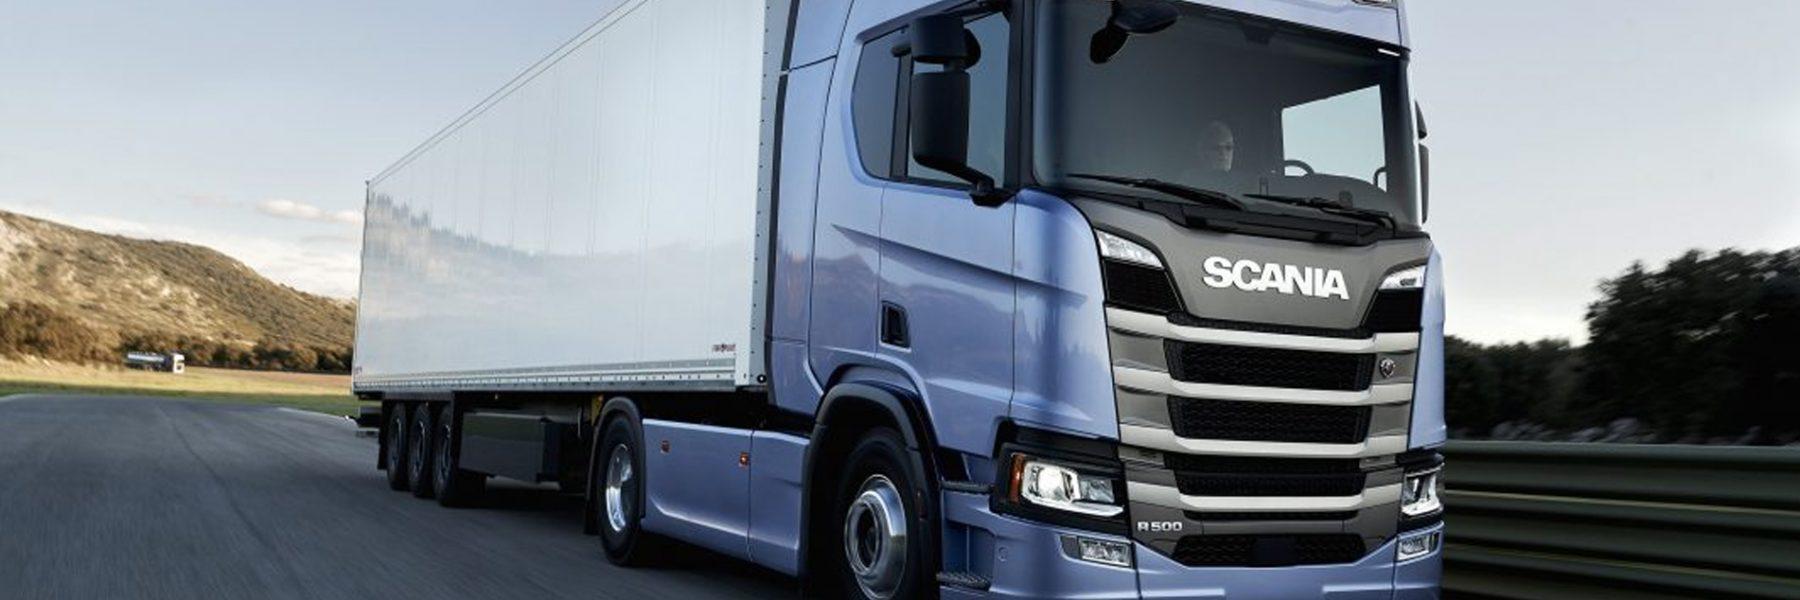 Truck 2138974